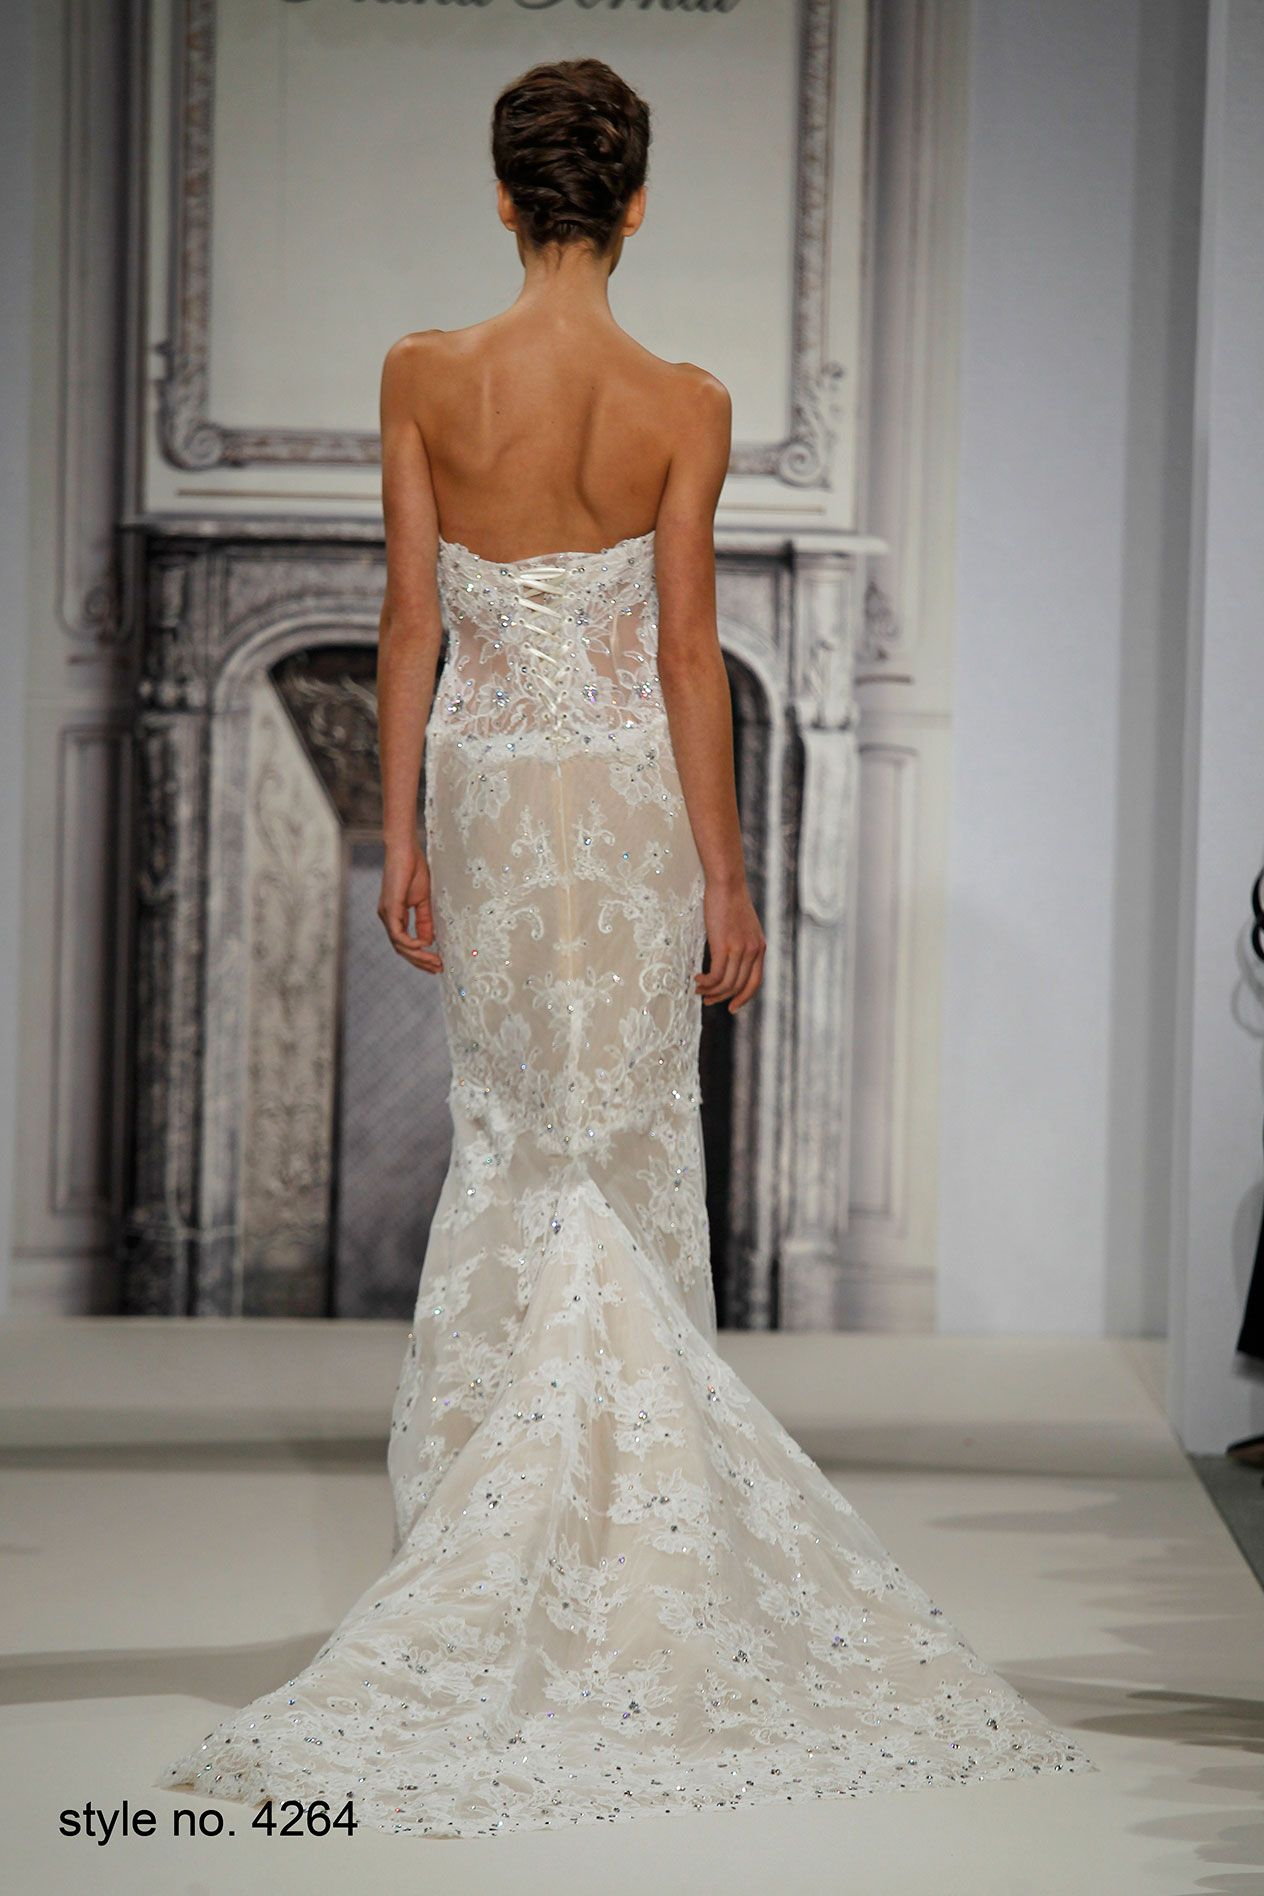 my dream wedding dress style no 9